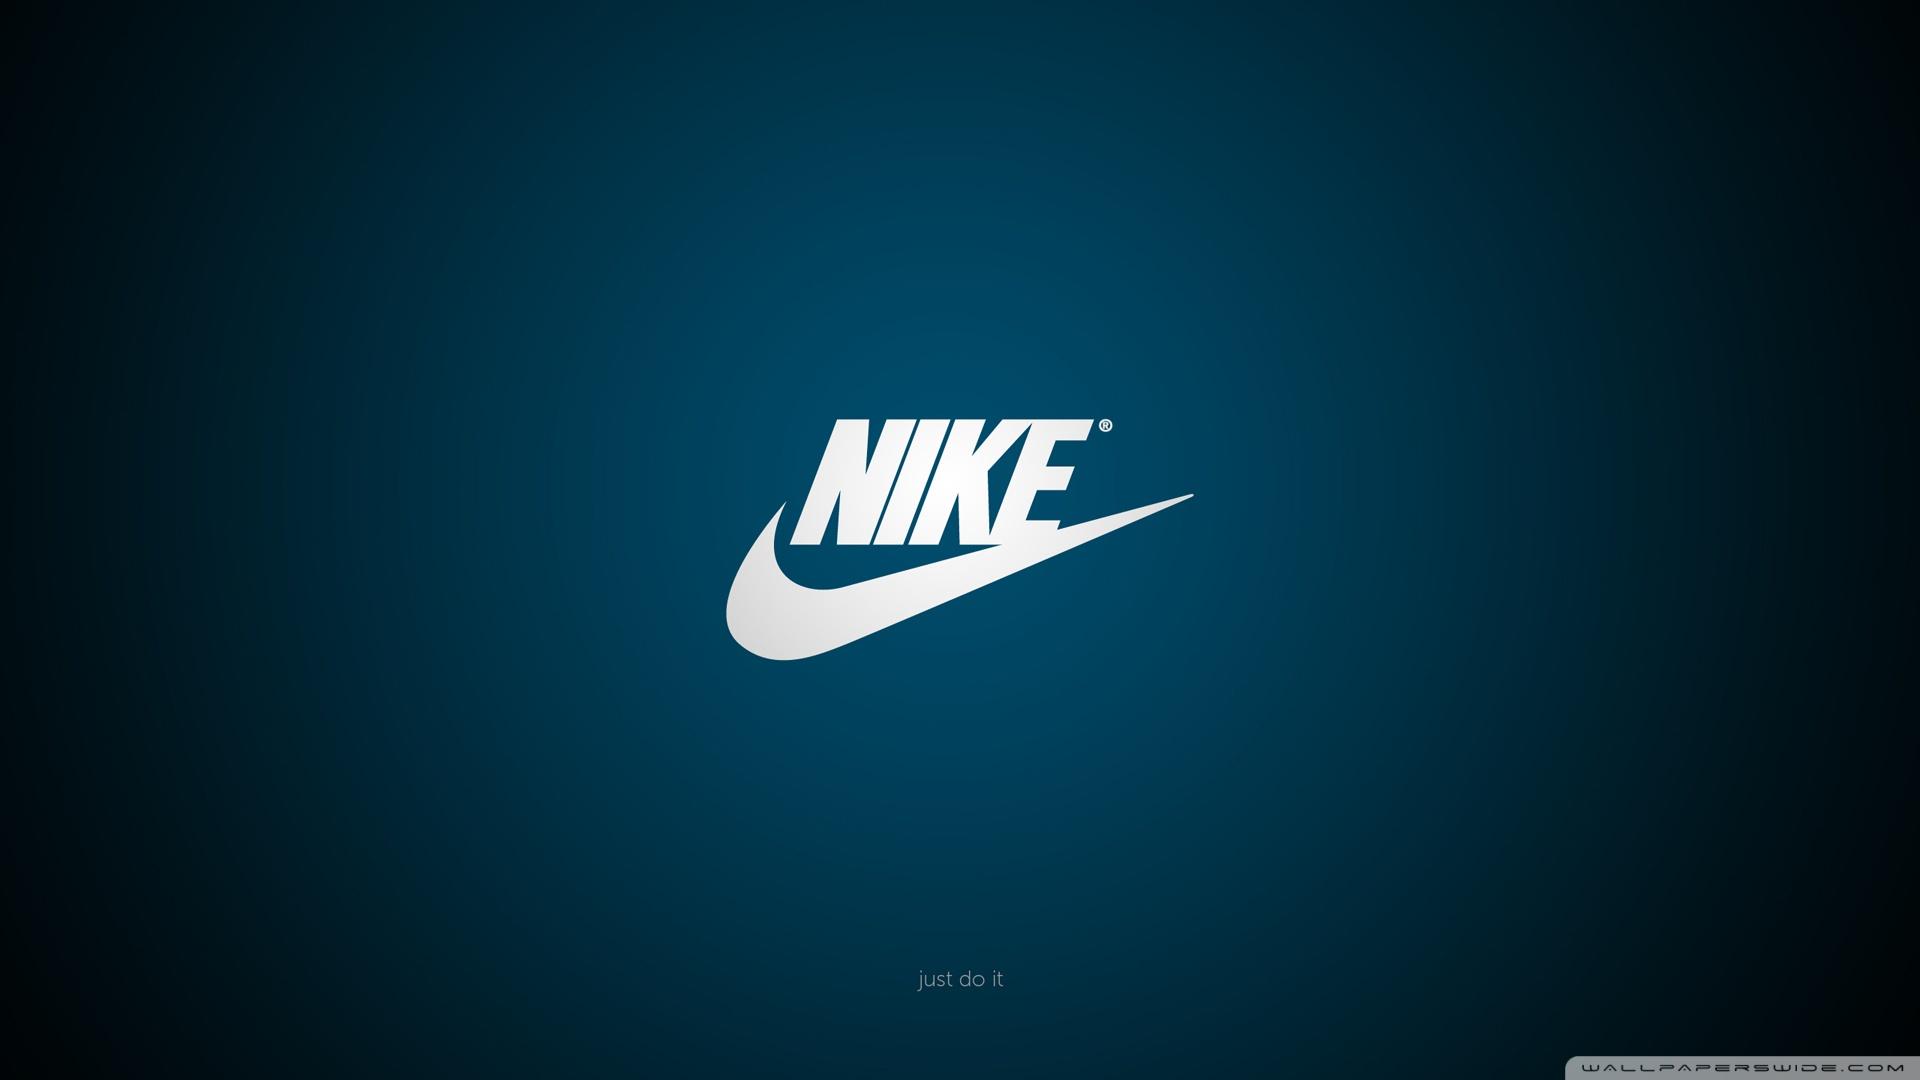 Nike Wallpaper 1920x1080 Nike 1920x1080